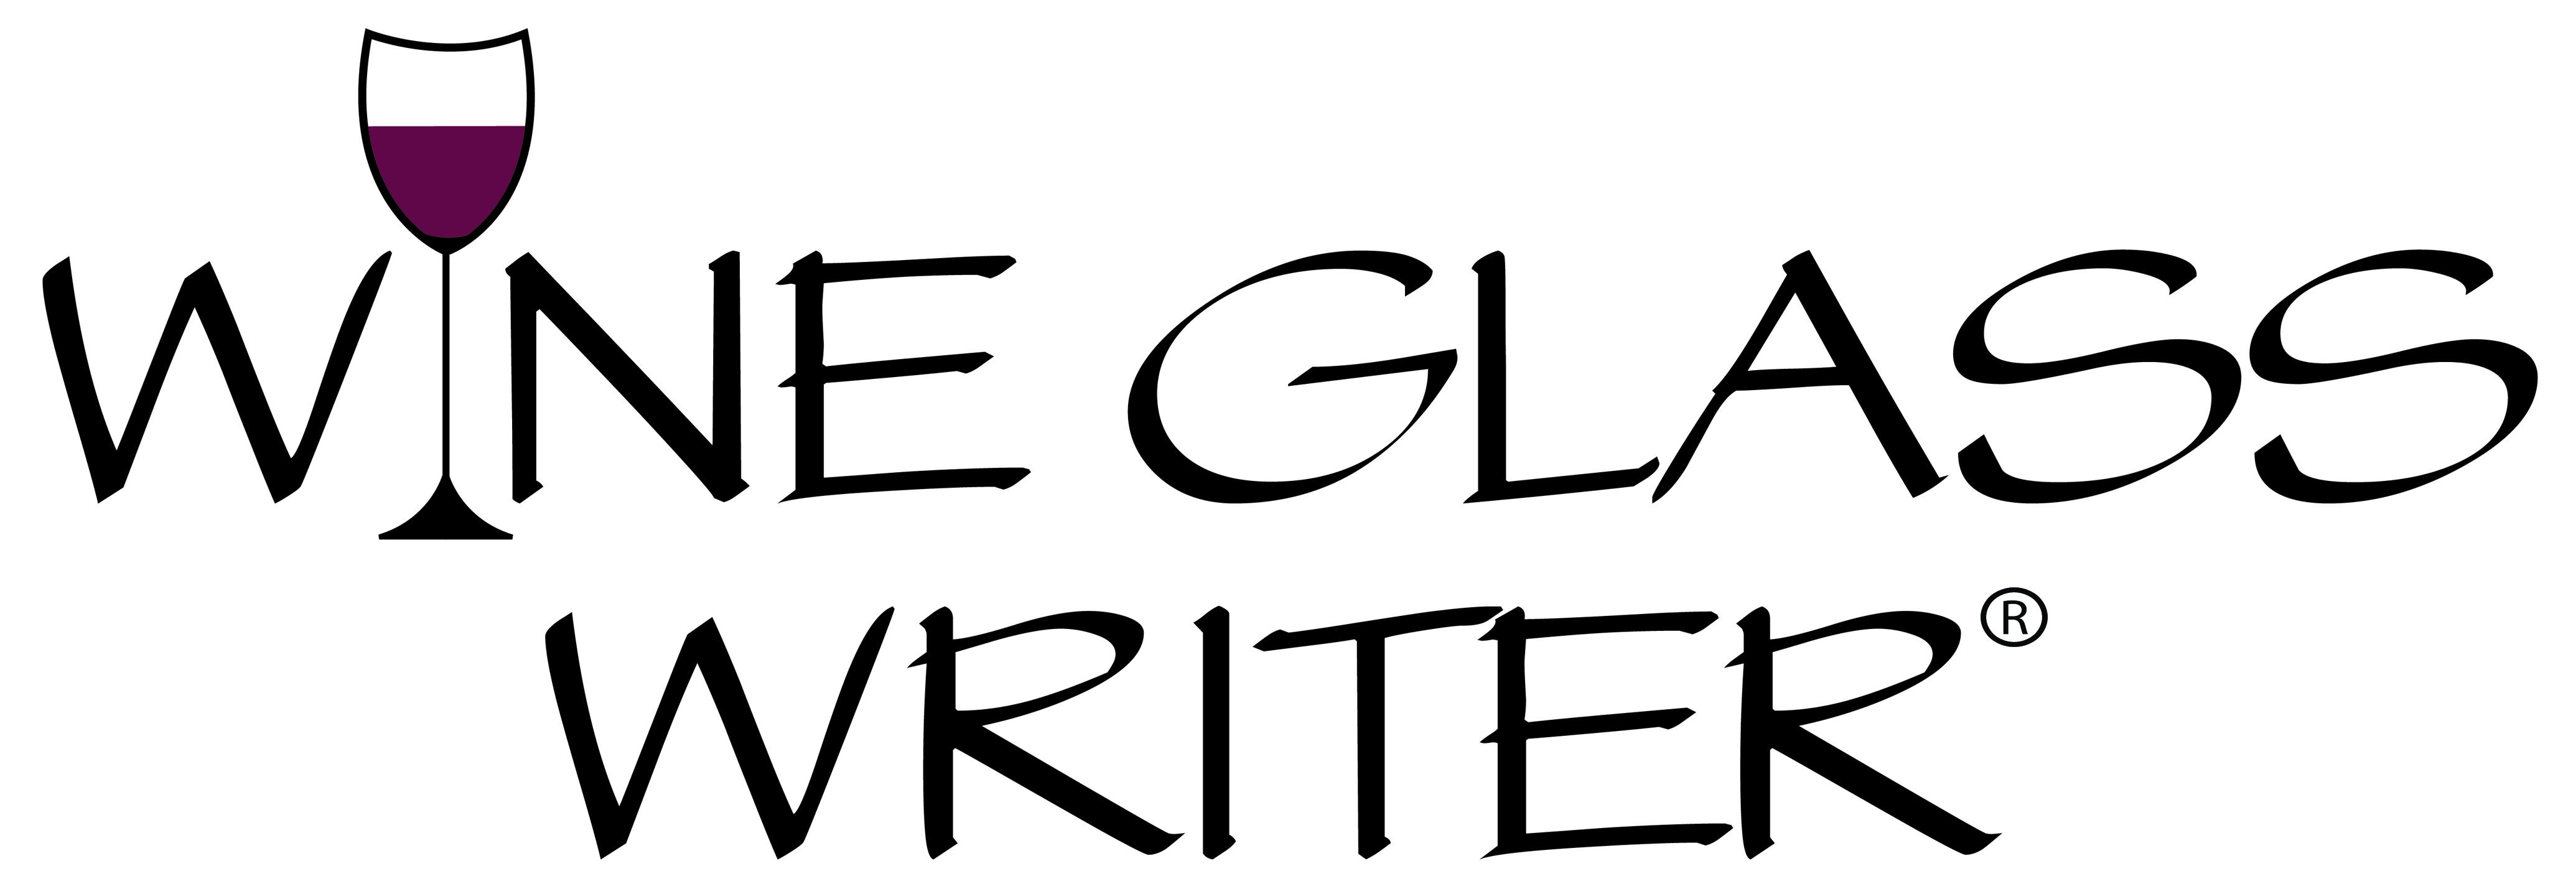 wine-glass-writer